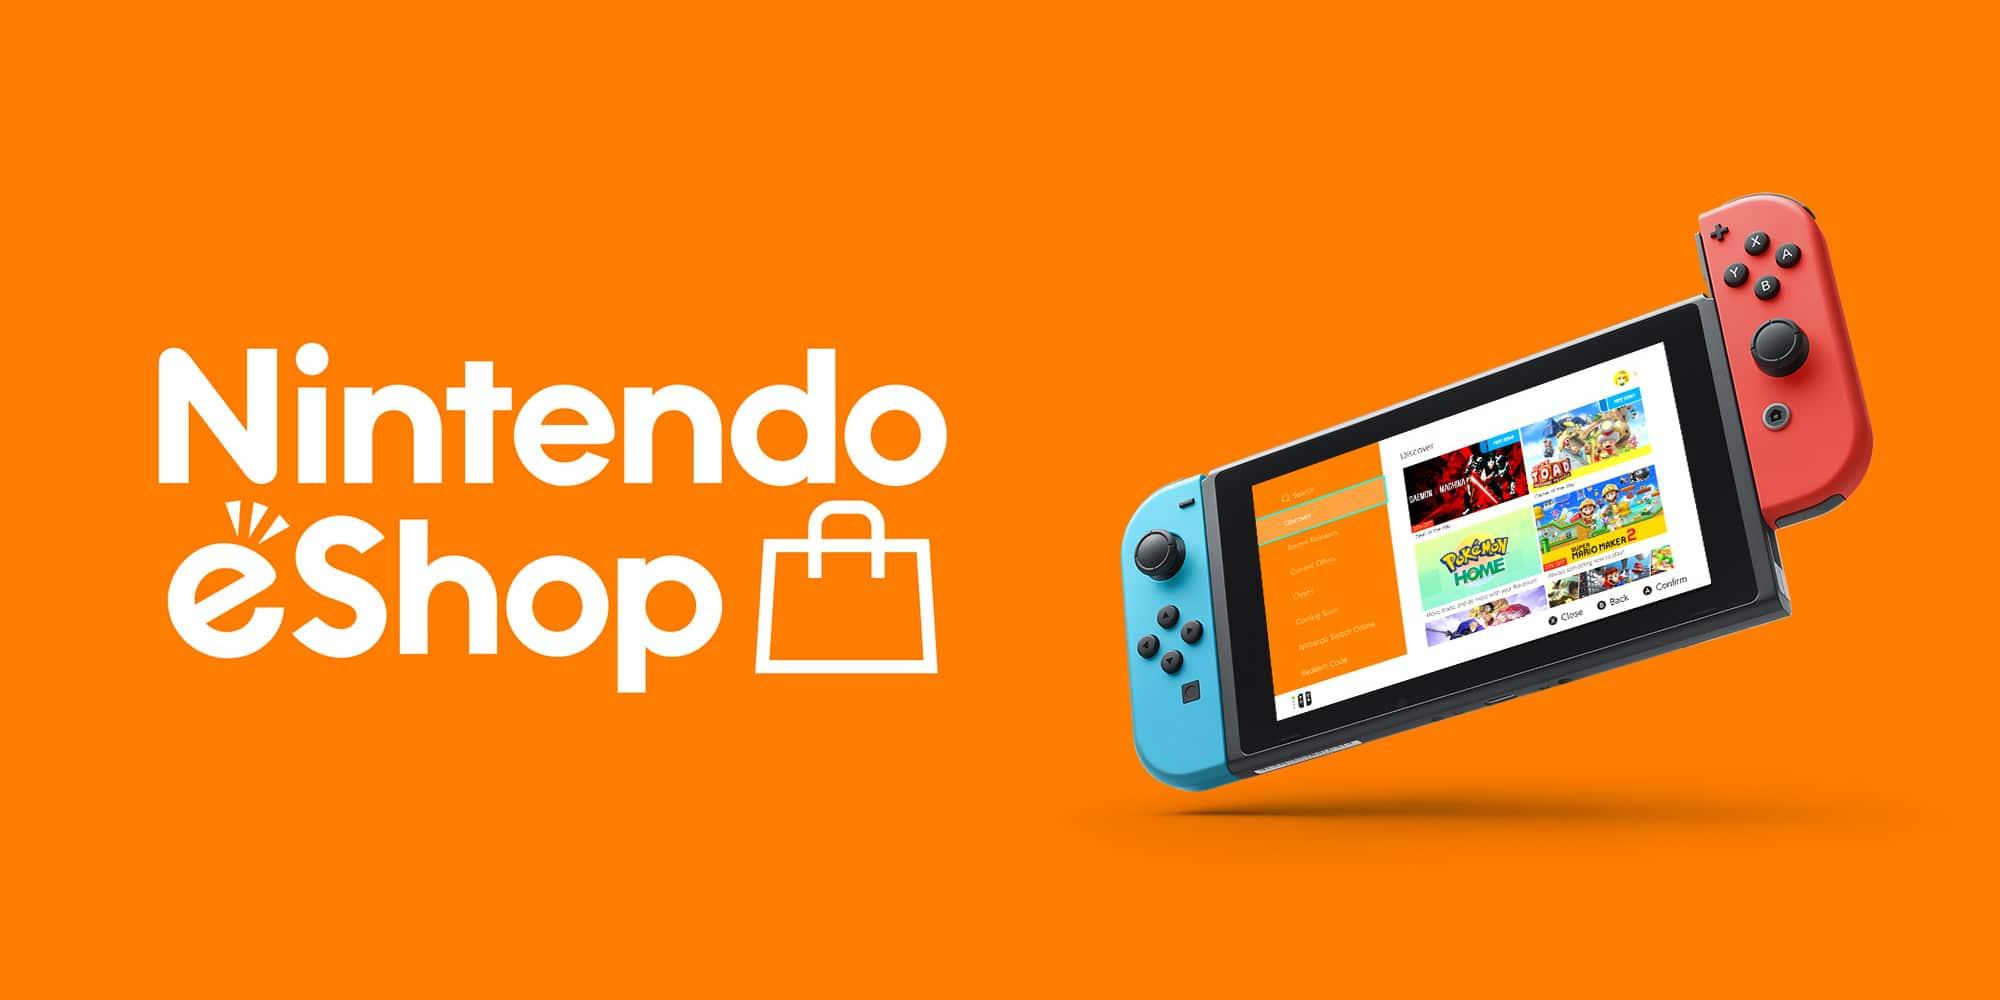 Nintendo eShop capture